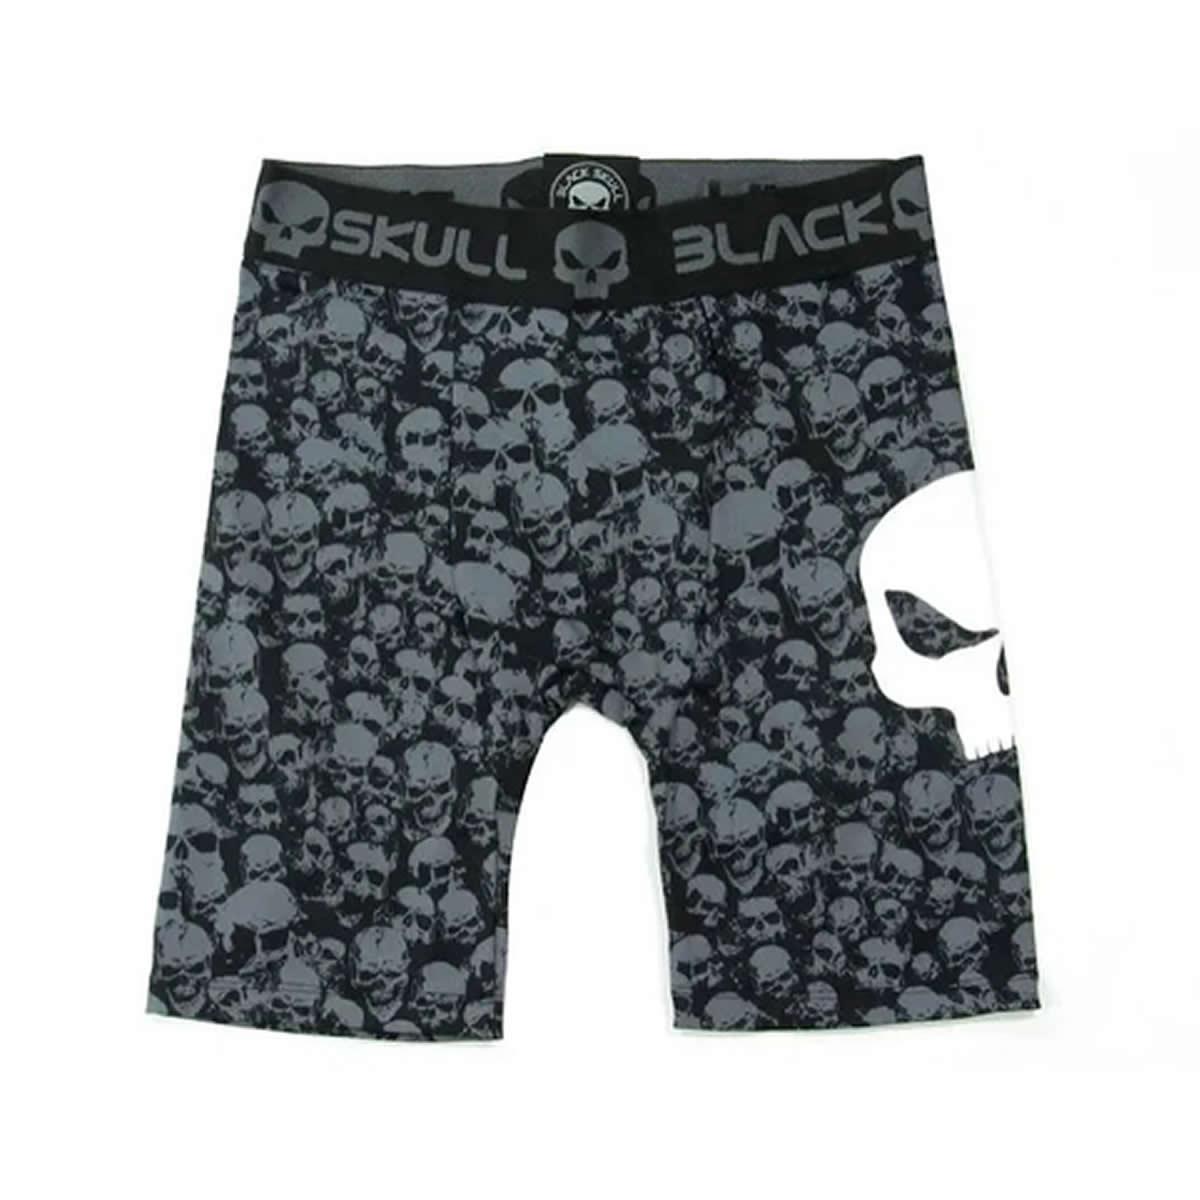 Compression Shorts Man Skull Preto - Black Skull